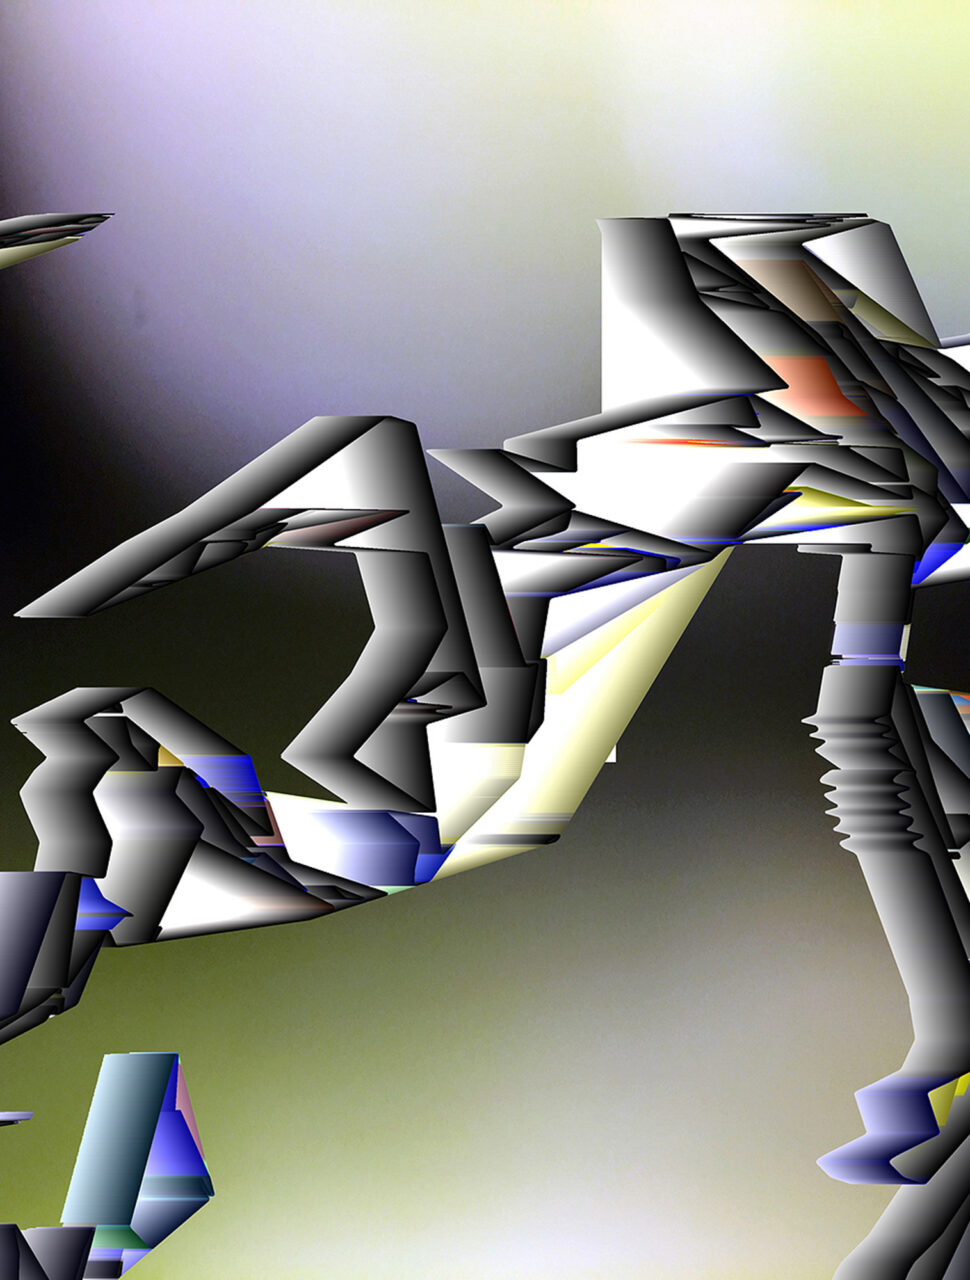 Trance, Mixed Media of Experimental Fine Art Photography, Colorpigment on Aludibond, mat, 2020, 90 x 68 cm, rückseitig signiert, aus der Reihe Unbewusstes Land